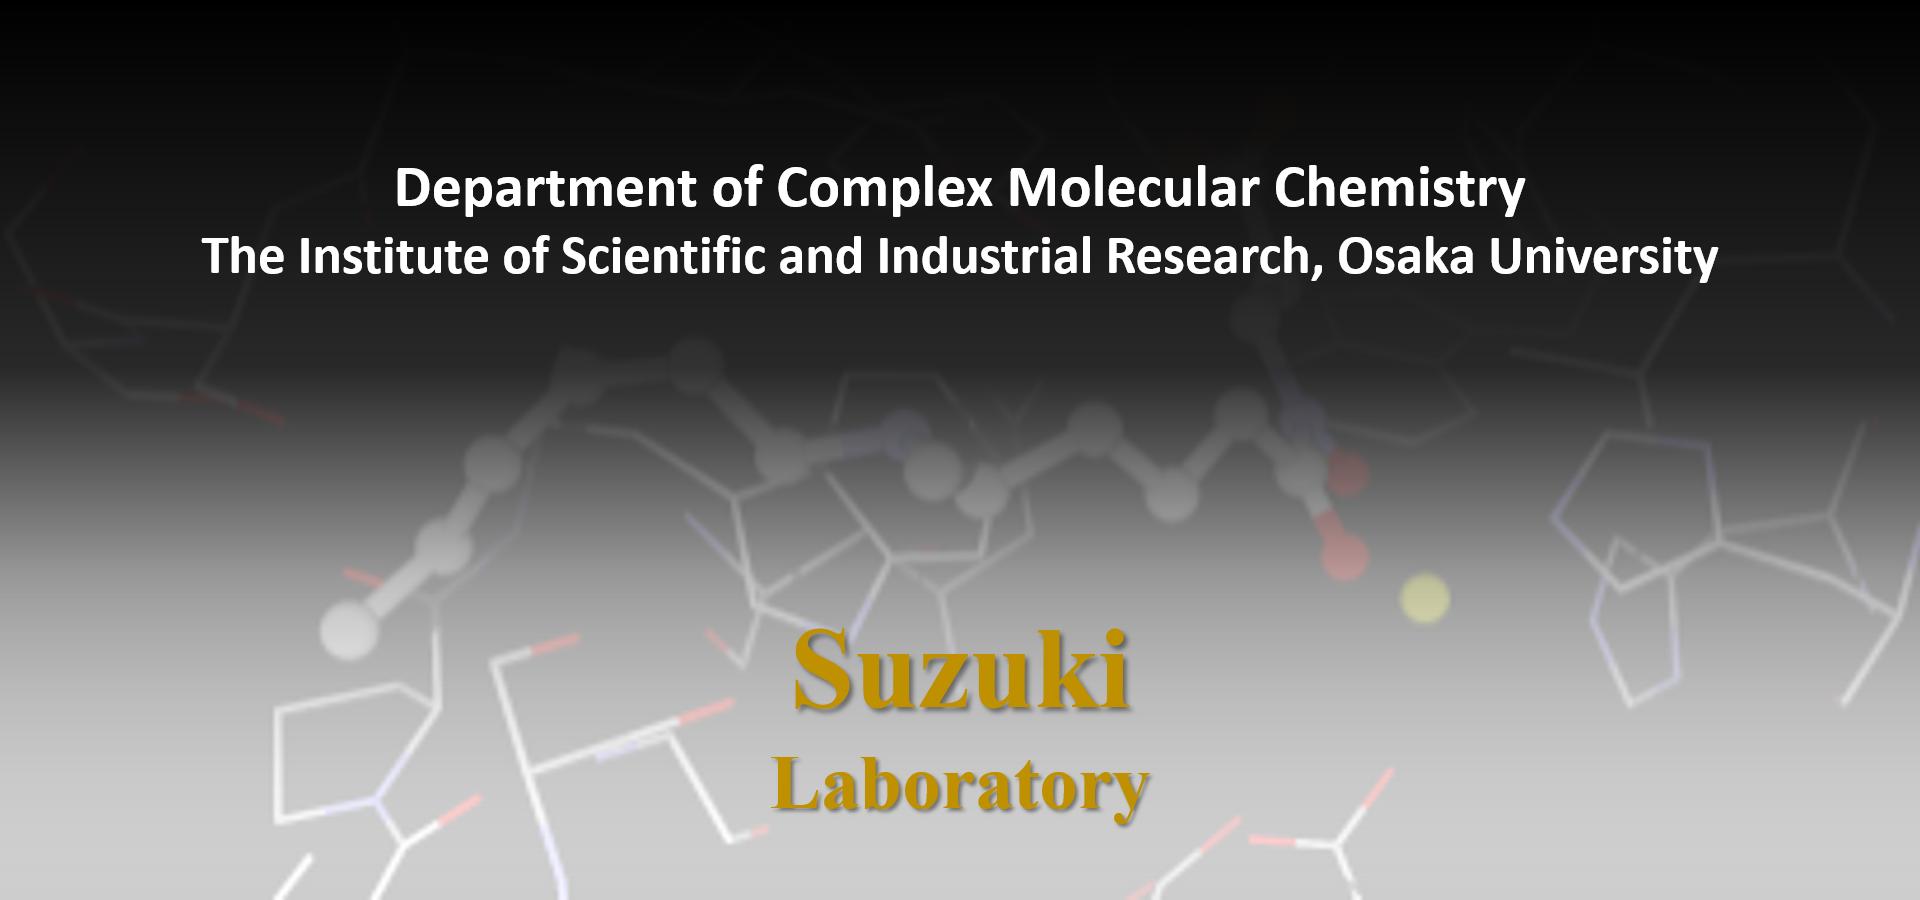 パーマリンク先: 大阪大学 産業科学研究所 複合分子化学研究分野